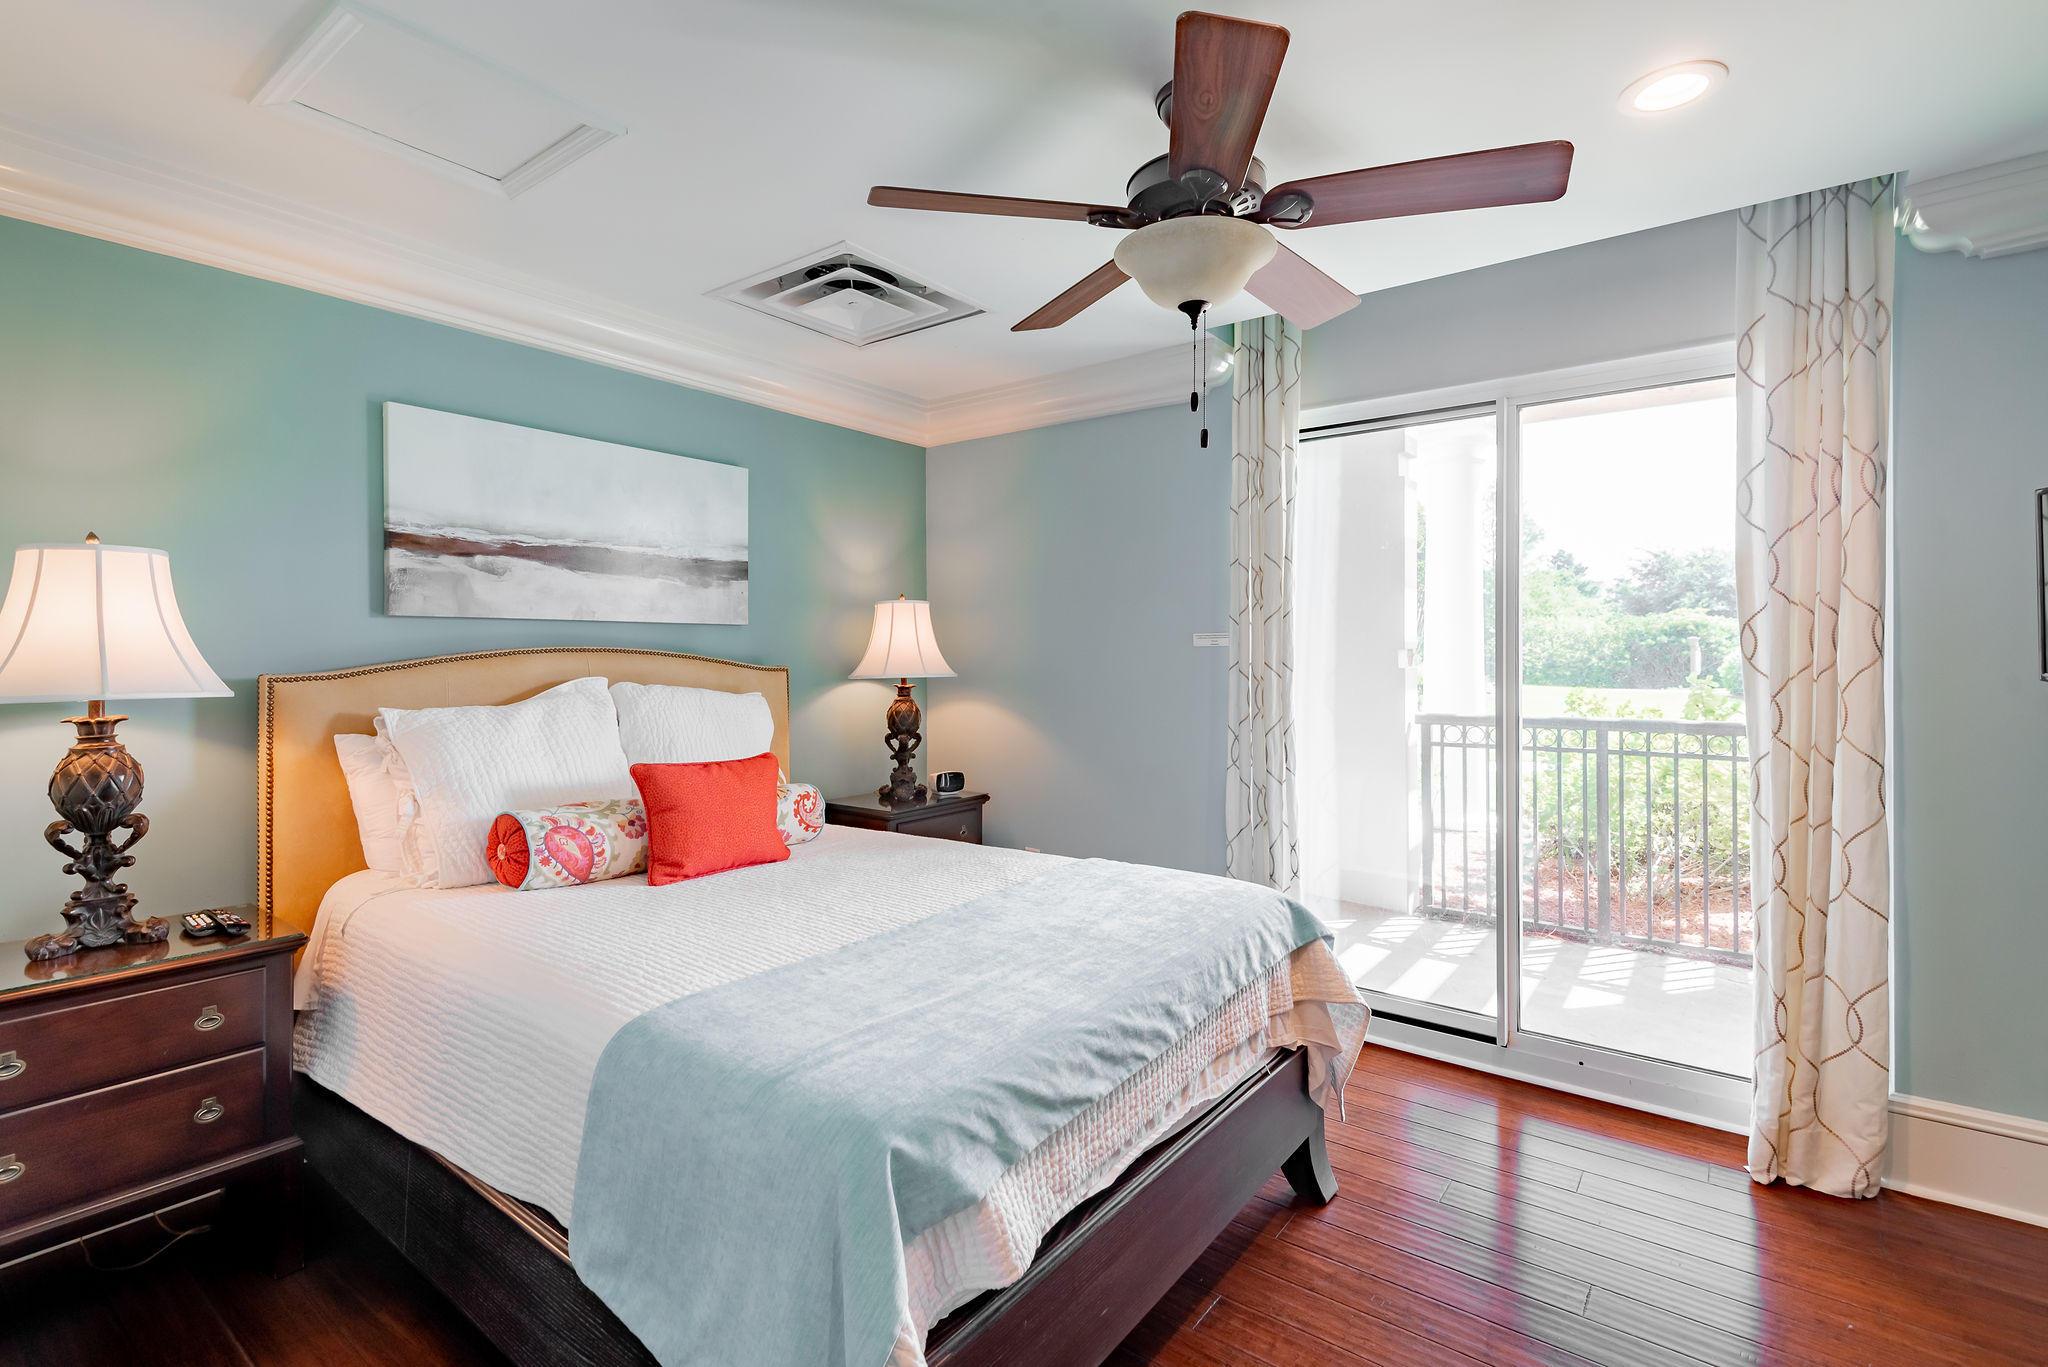 Renaissance On Chas Harbor Homes For Sale - 211 Plaza, Mount Pleasant, SC - 4